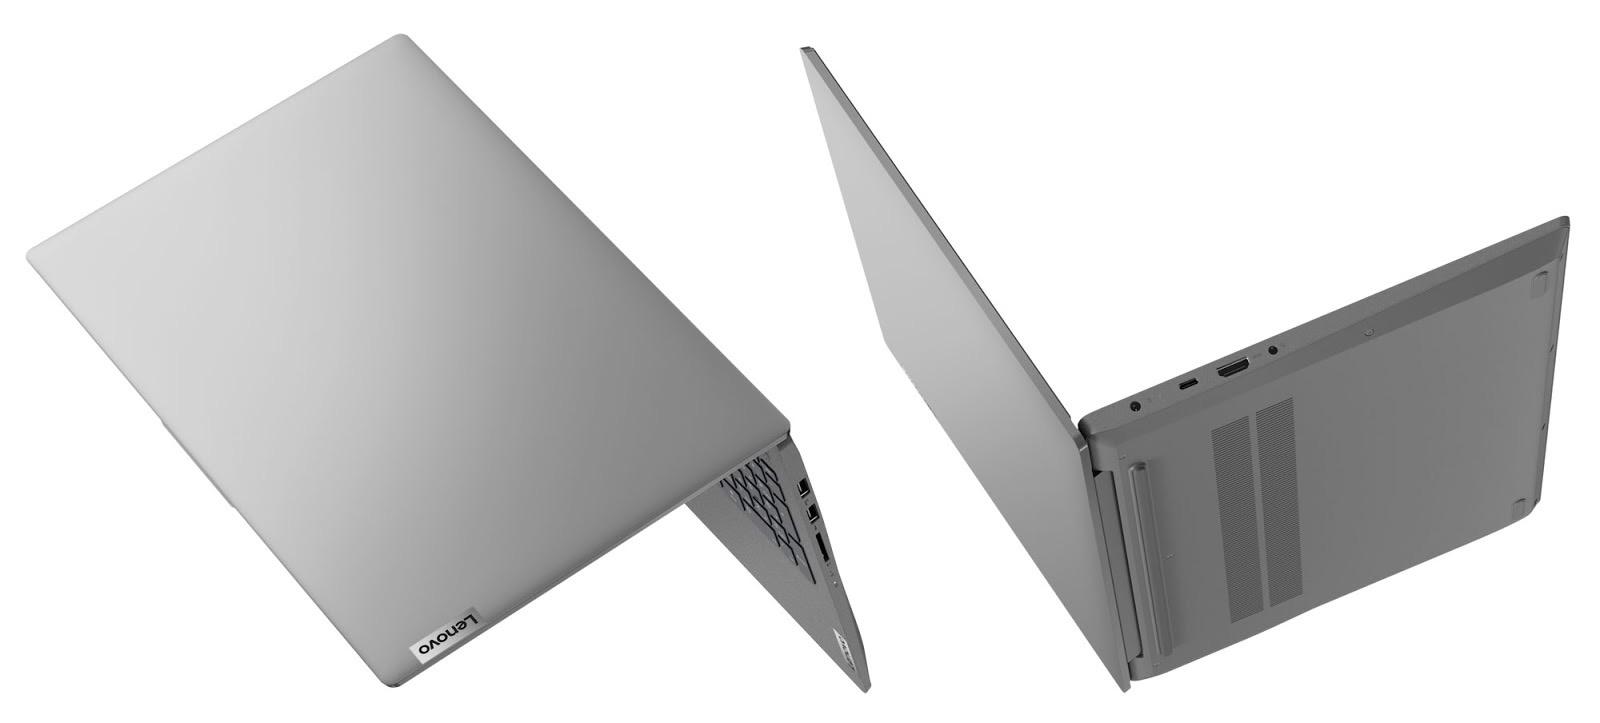 Фото 2. Ноутбук Lenovo ideapad 5 15IIL05 Platinum Grey (81YK00GBRE)